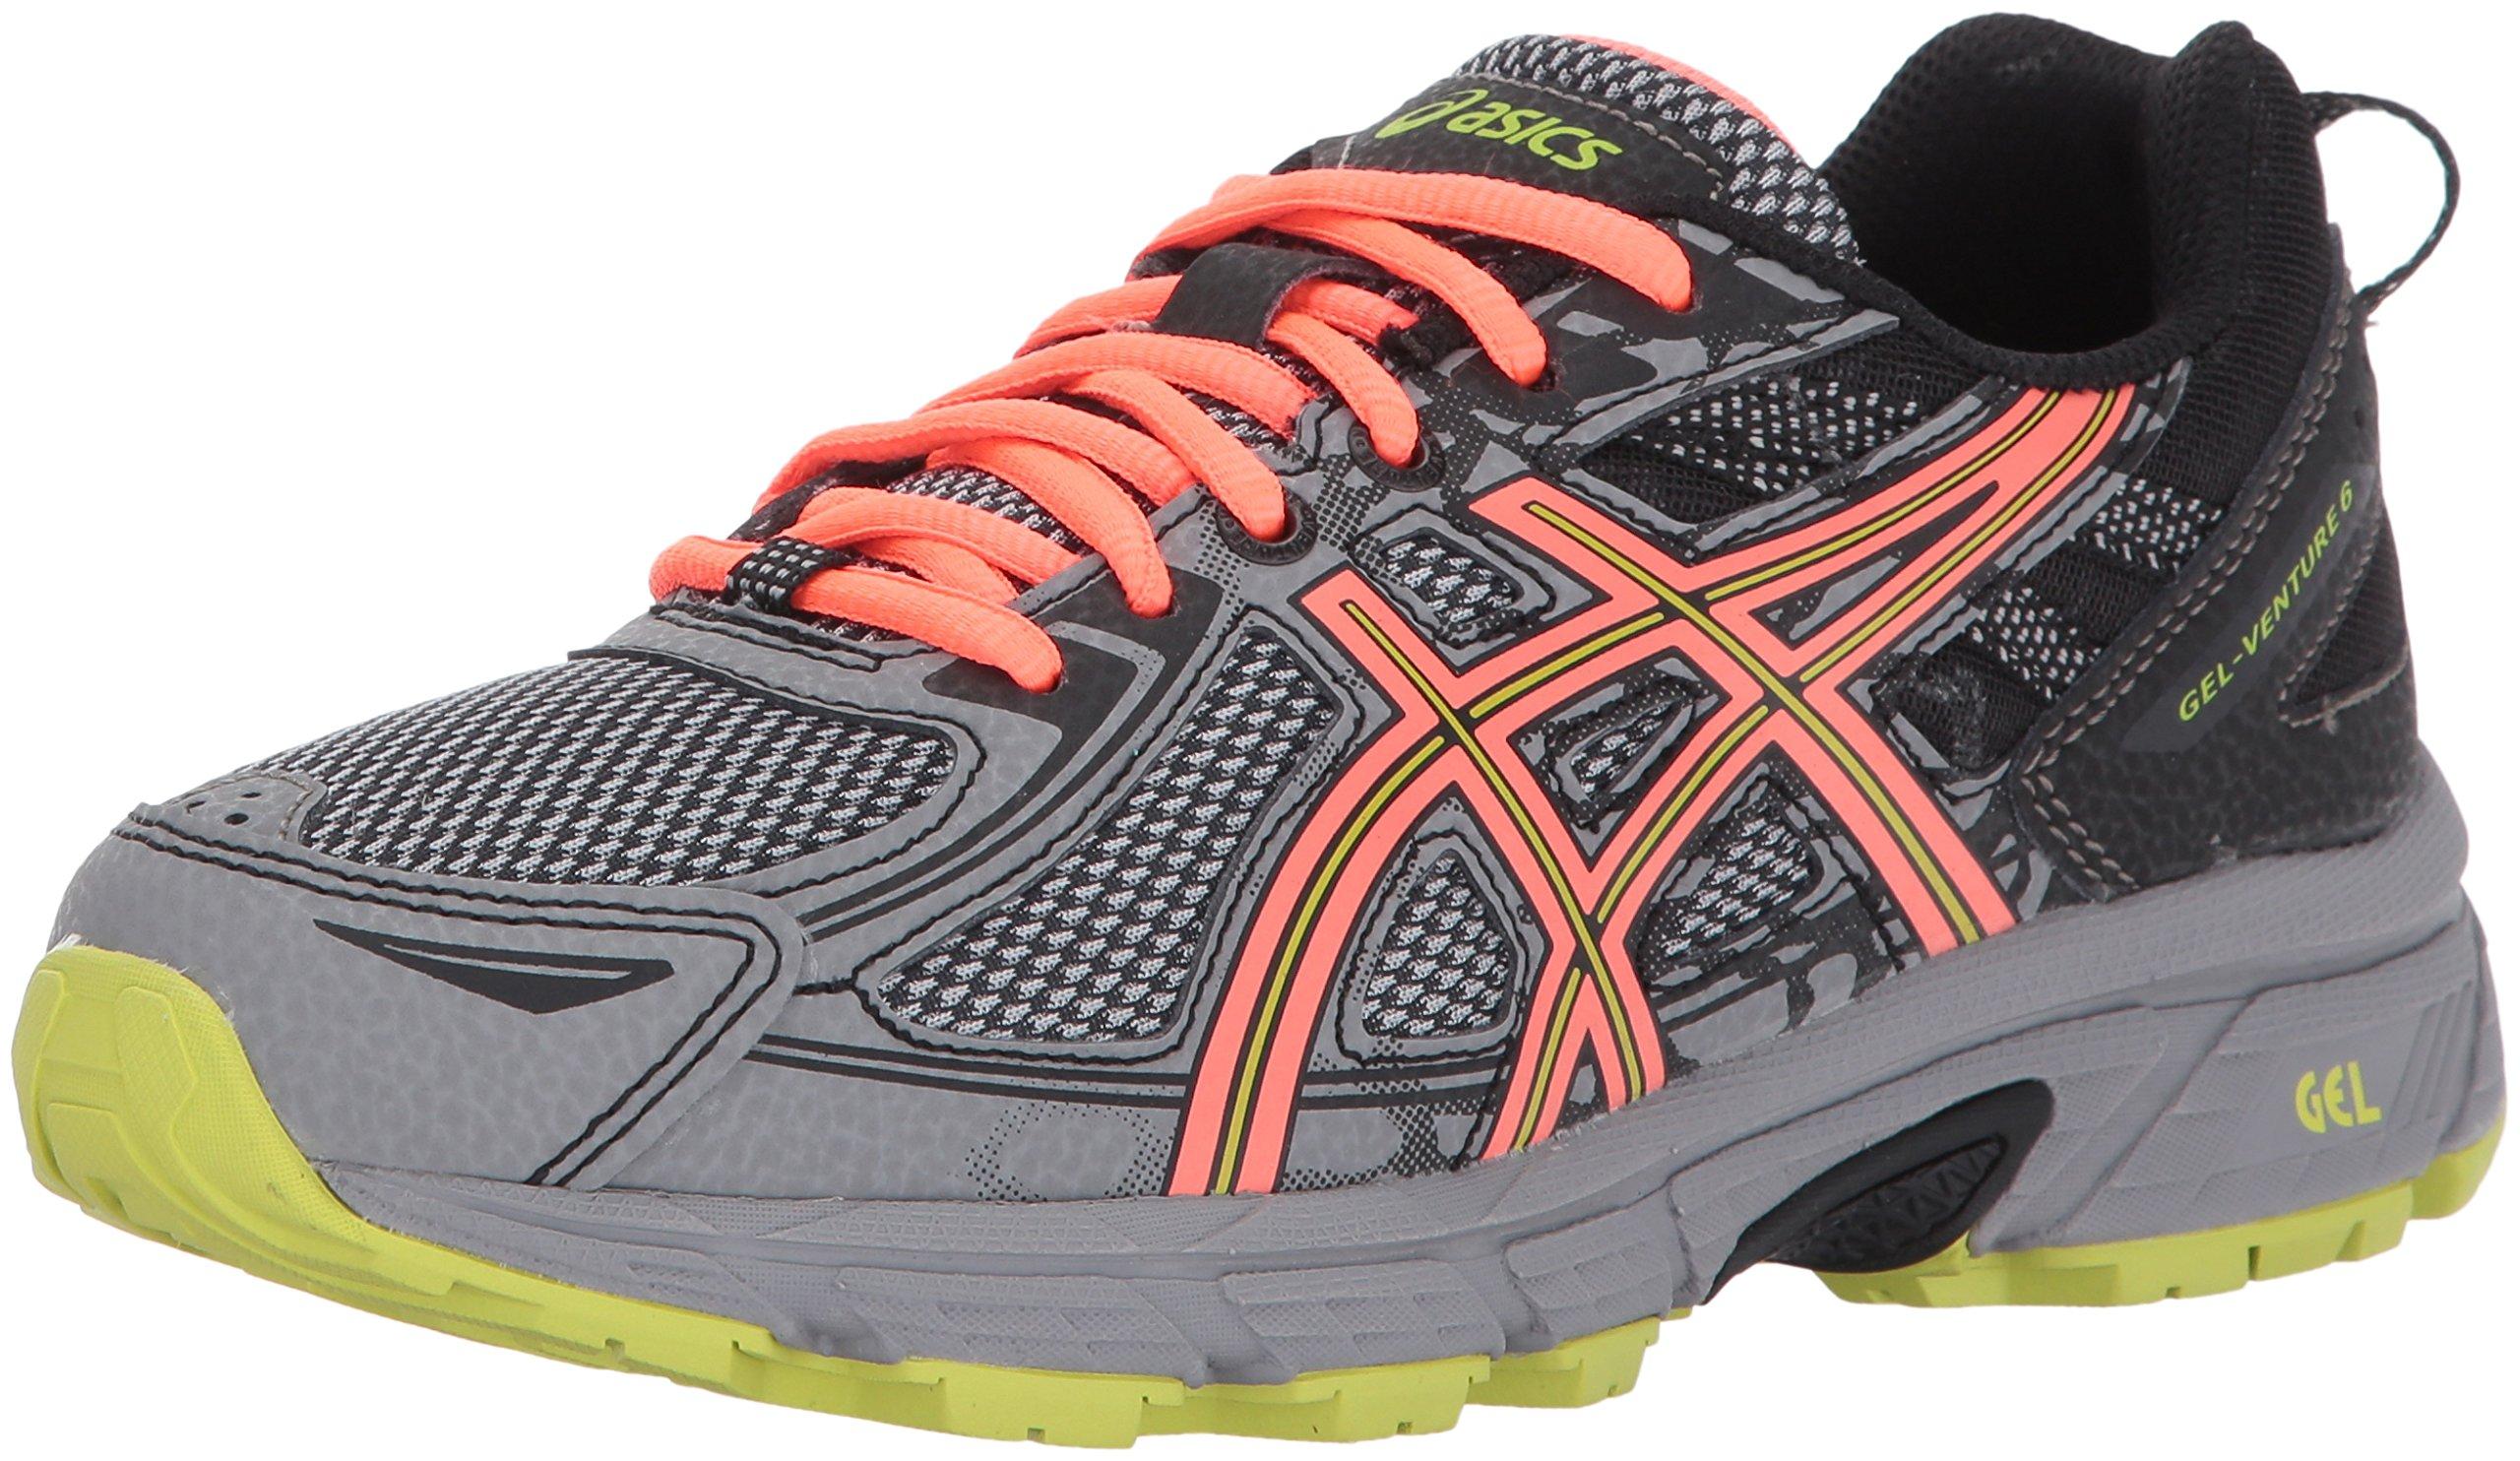 ASICS Women's Gel-Venture 6 Running-Shoes,Phantom/Coral/Lime,10 Medium US by ASICS